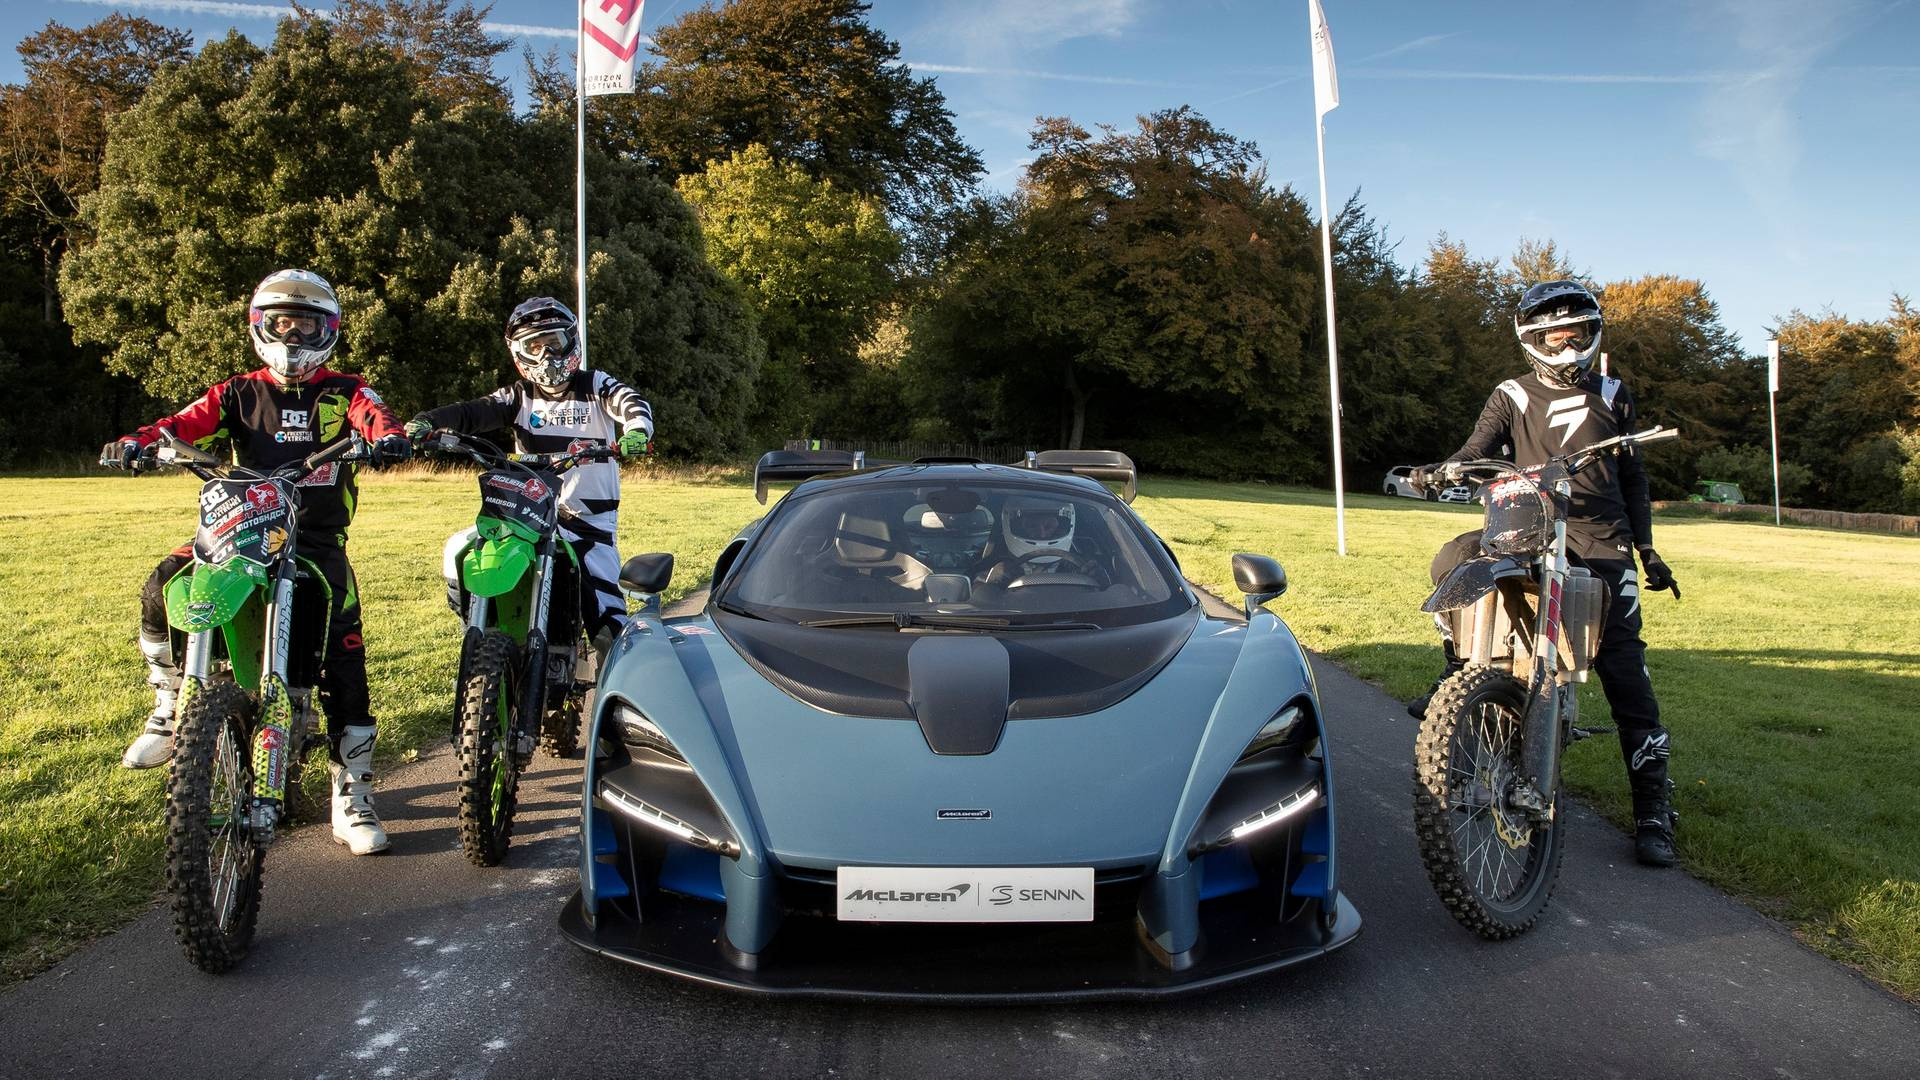 mclaren launches forza horizon 4 with epic goodwood race